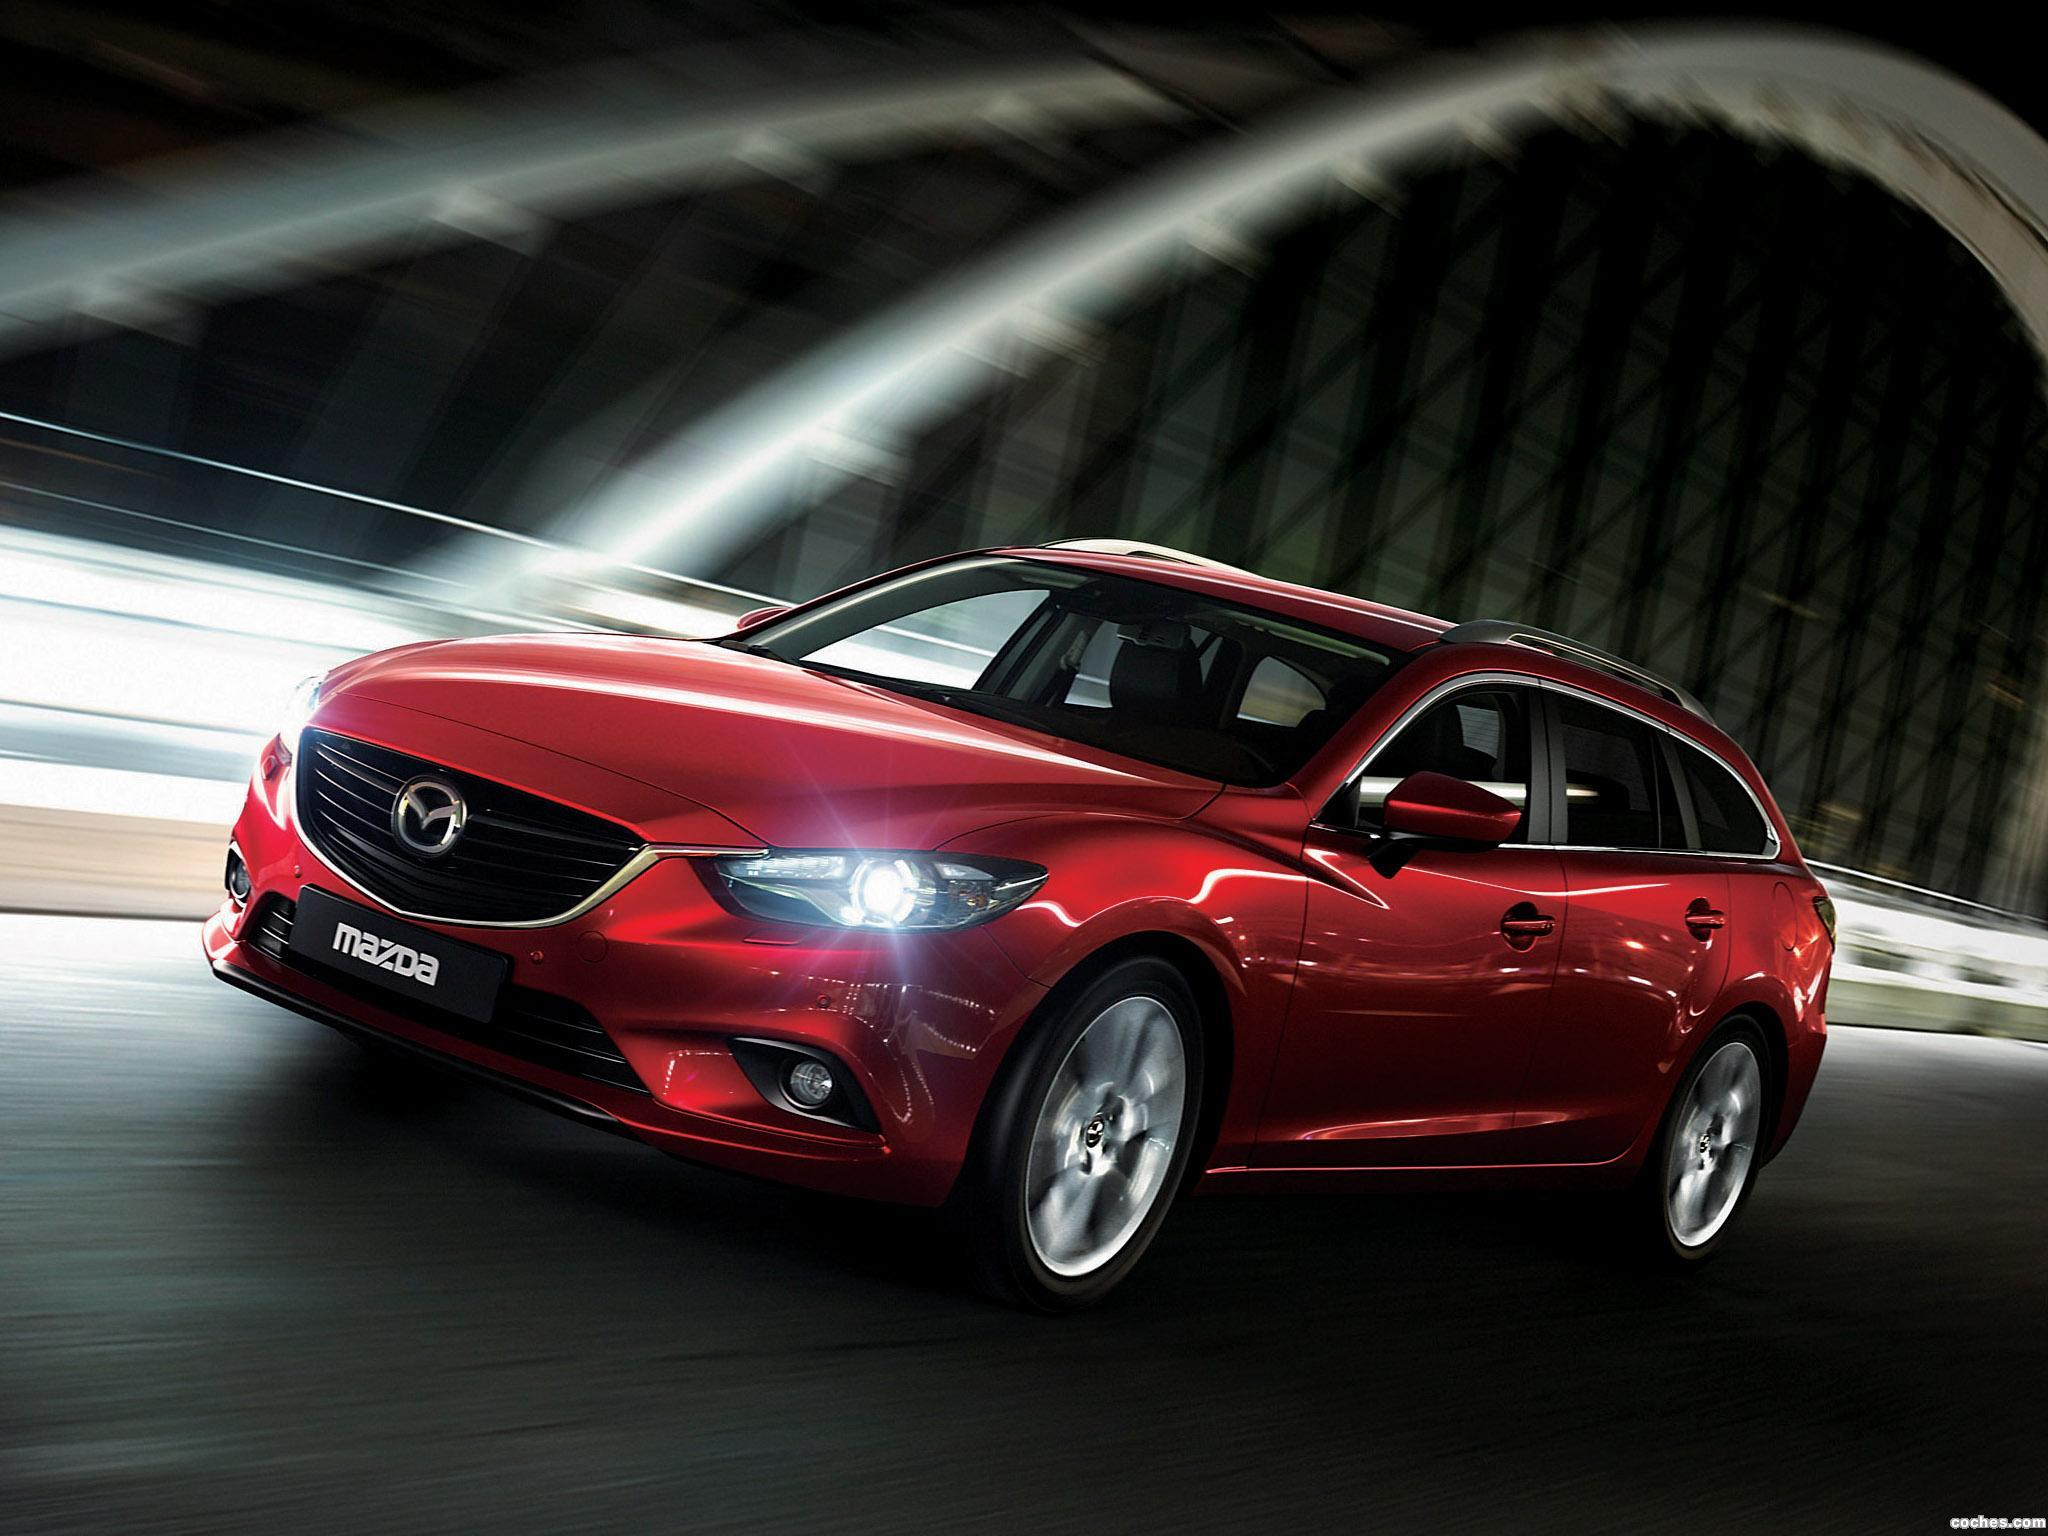 Foto 3 de Mazda 6 Wagon 2013